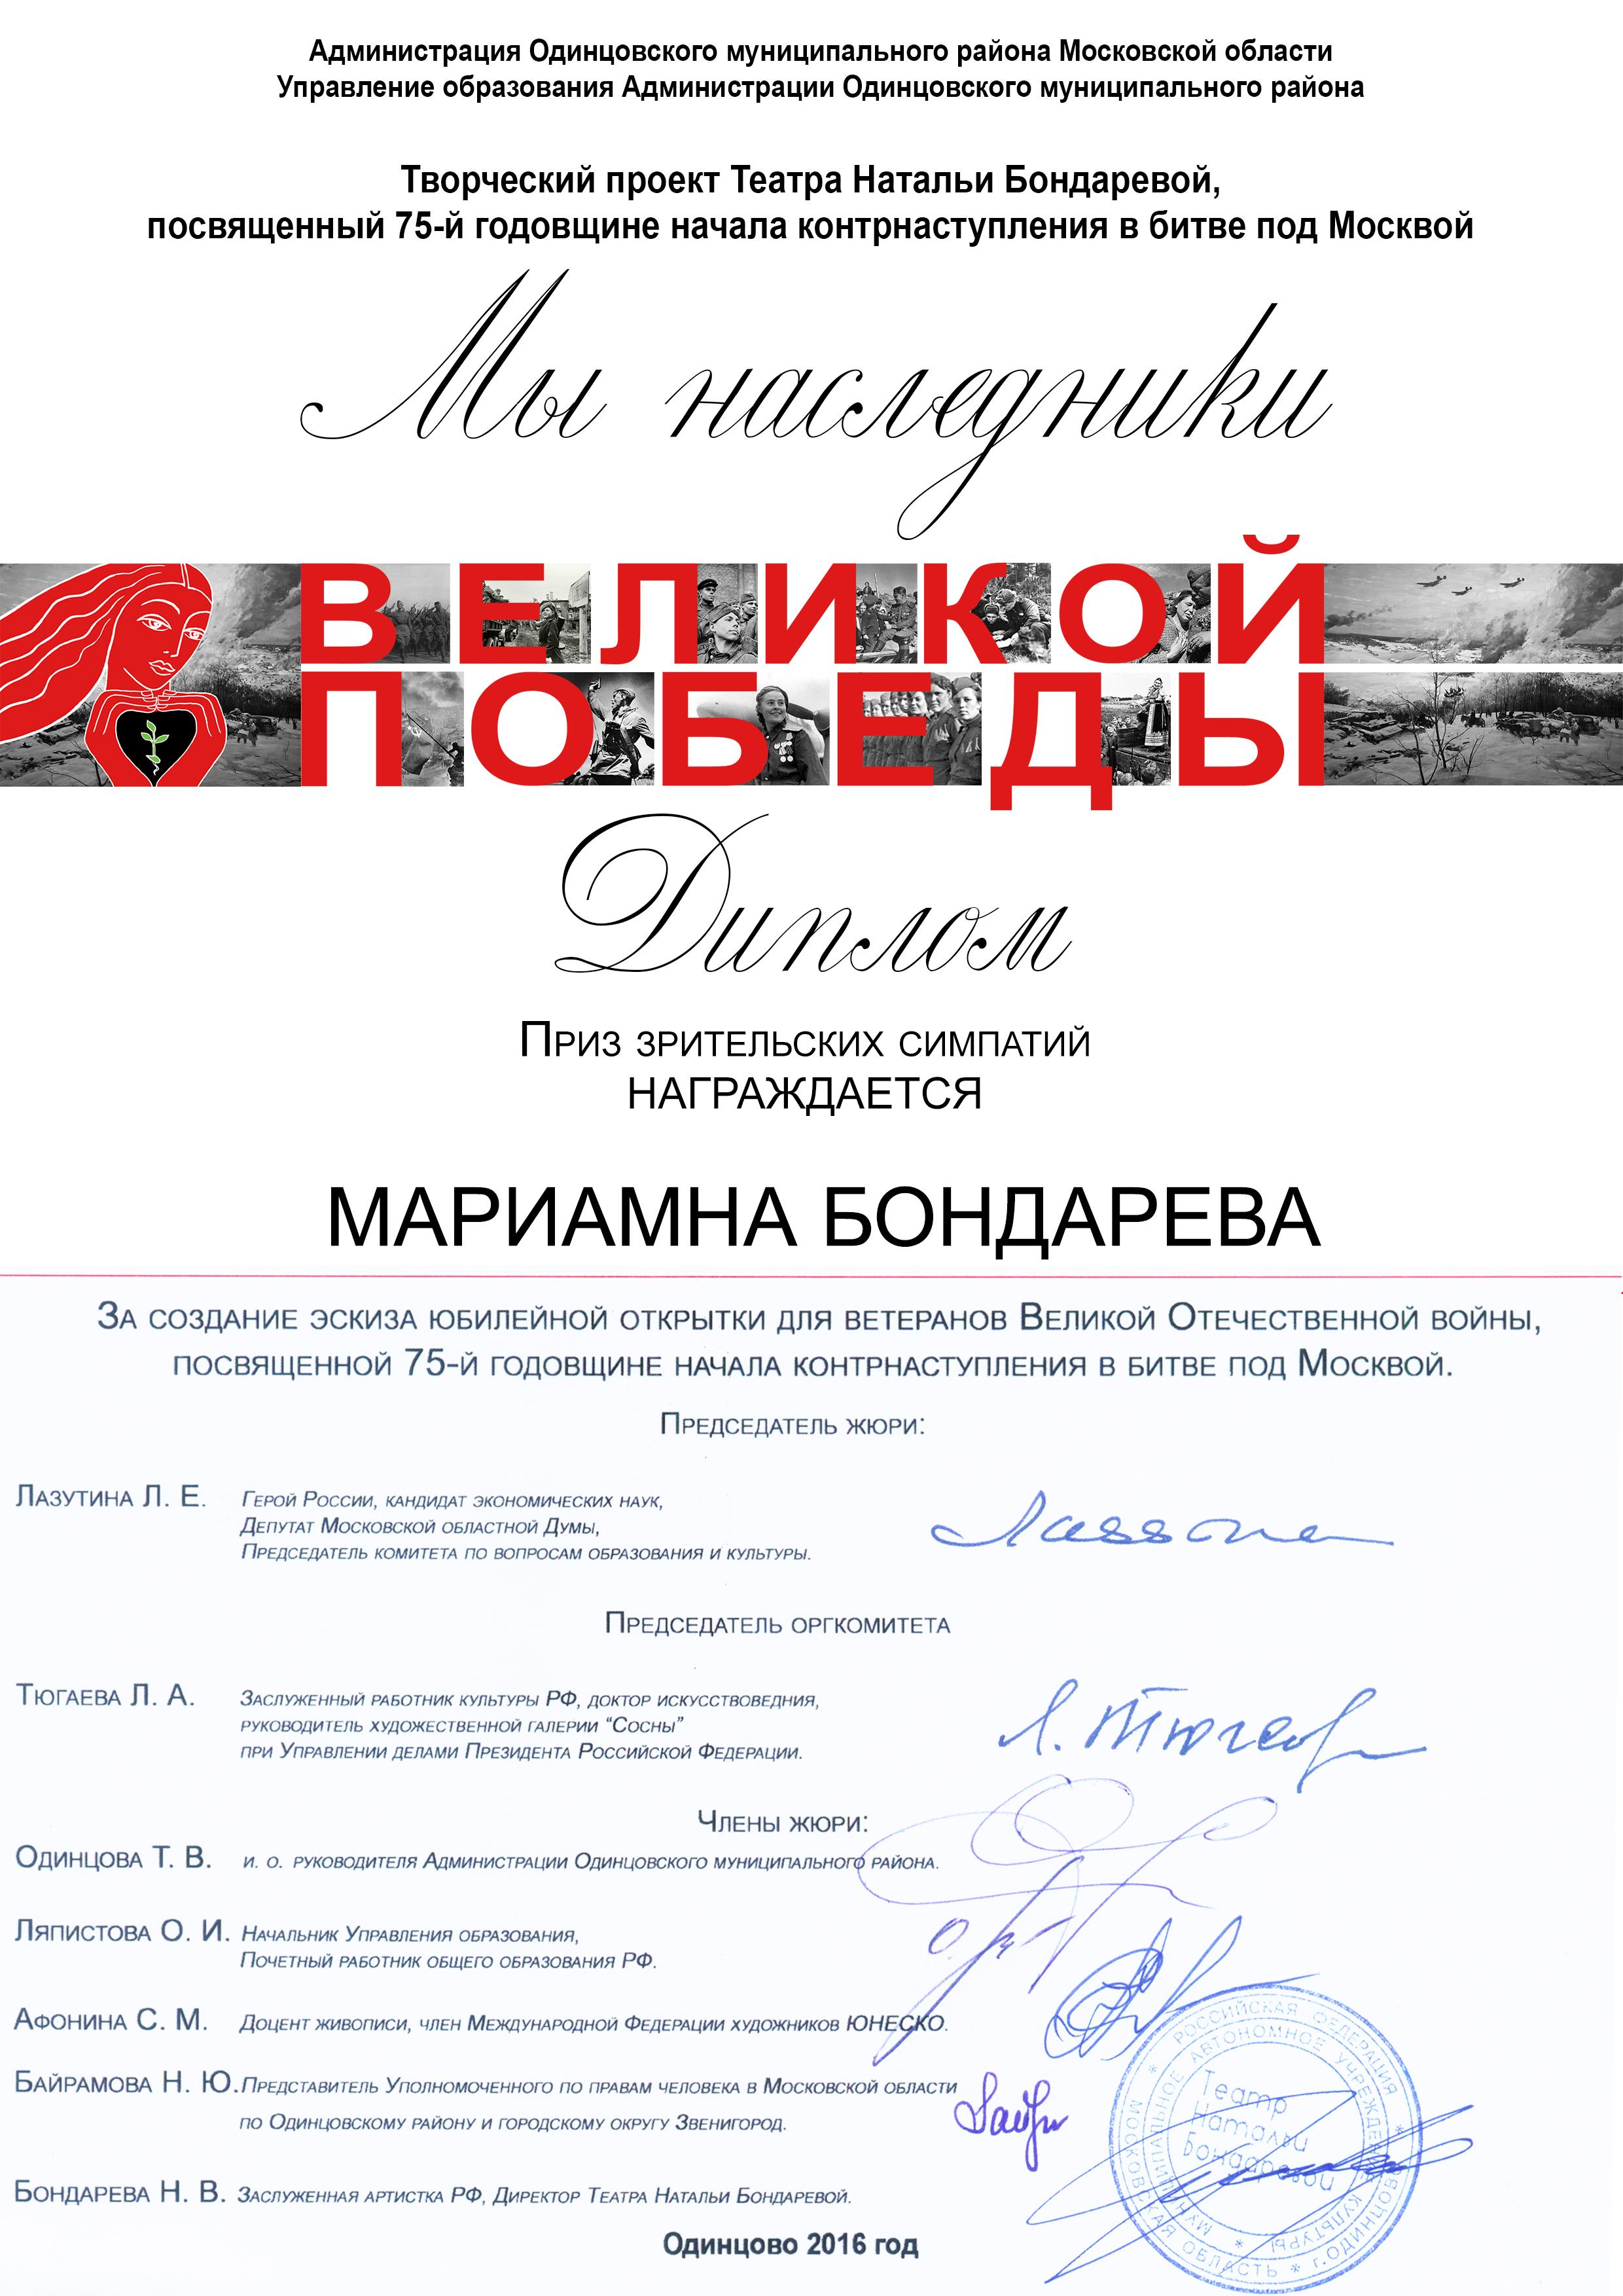 Мариамна Бондарева